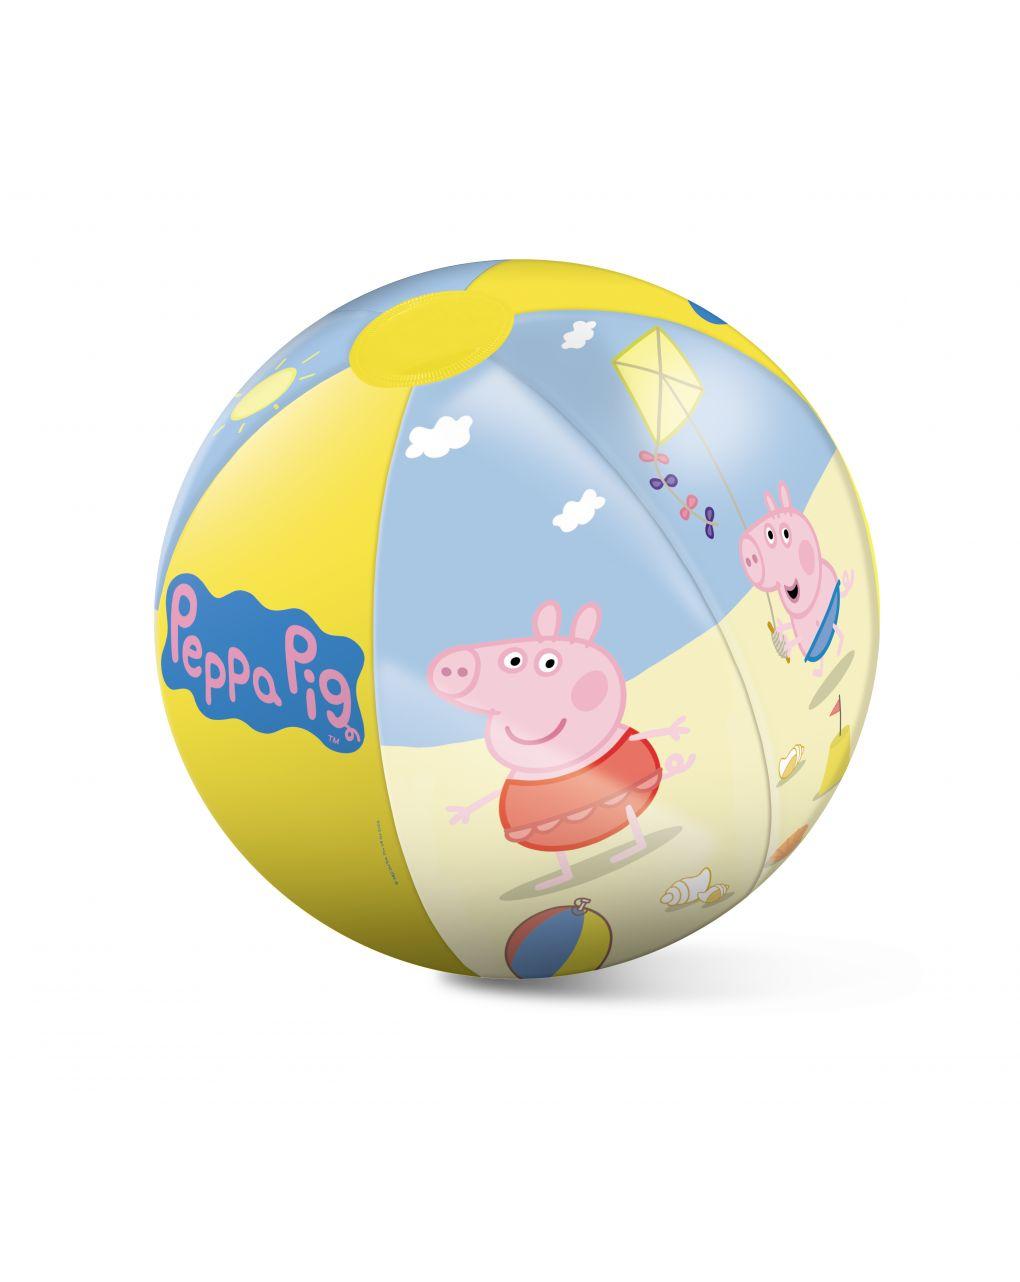 Mondo - peppa pig palla gonfiabile d. 50 cm - Mondo